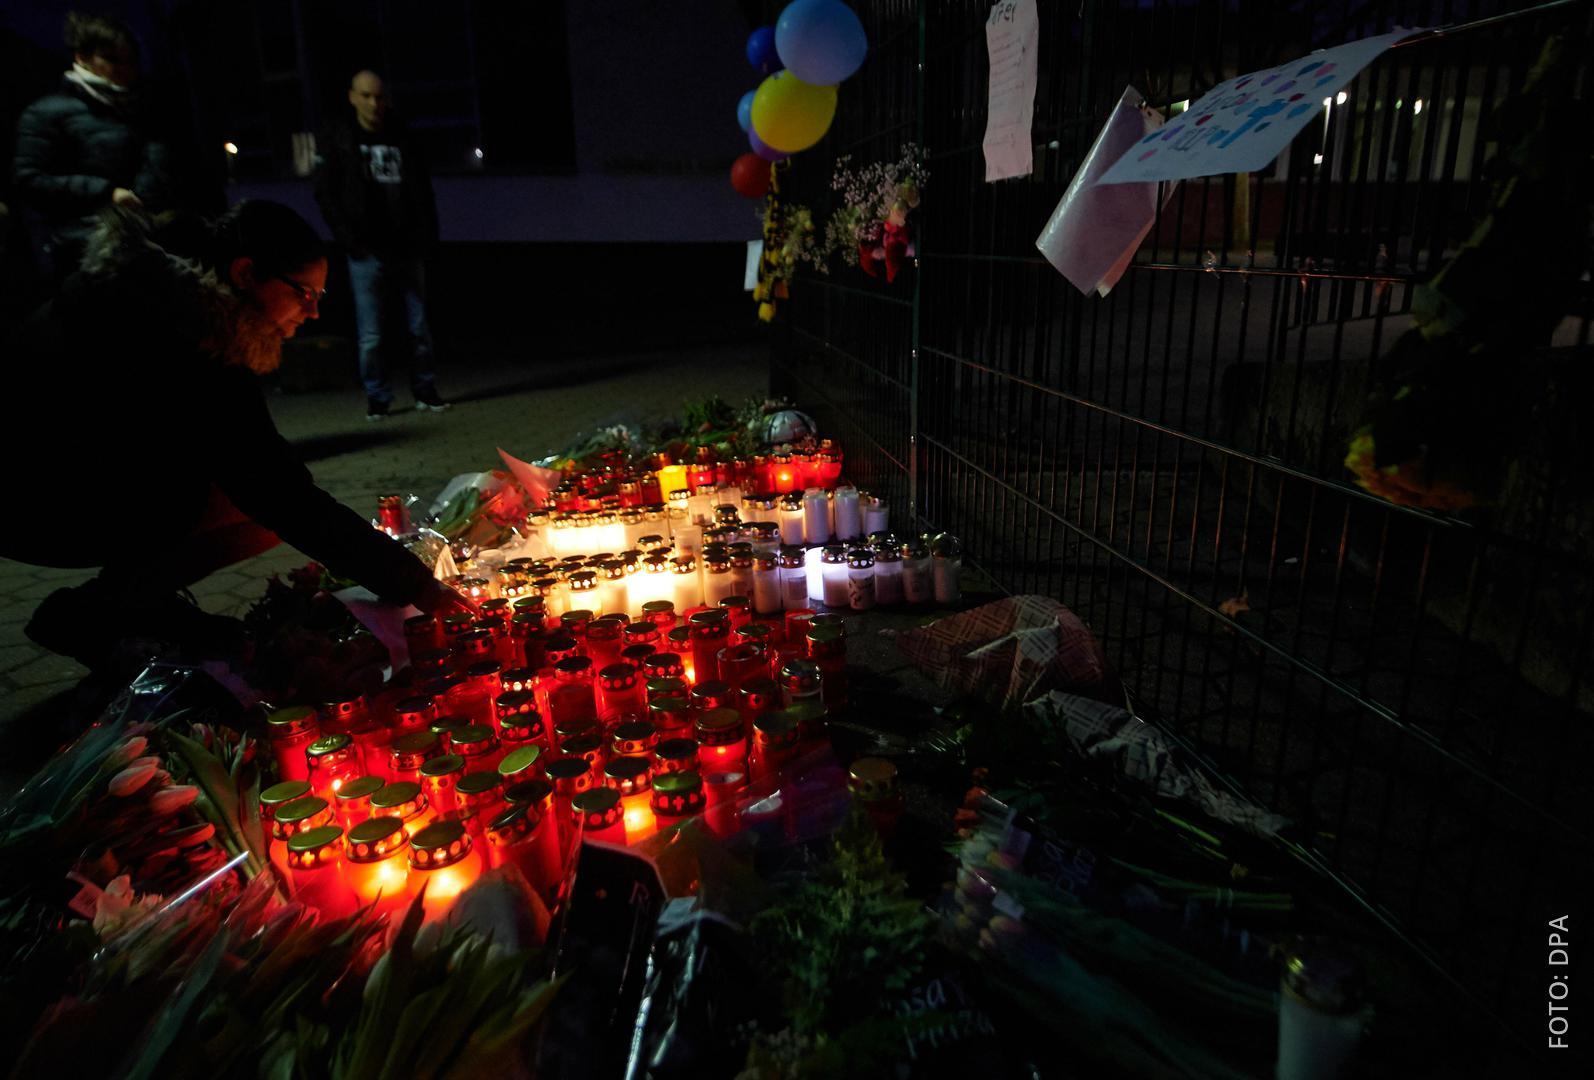 Eine Schülerin hat im Januar Kerzen an der Gesamtschule abgestellt.